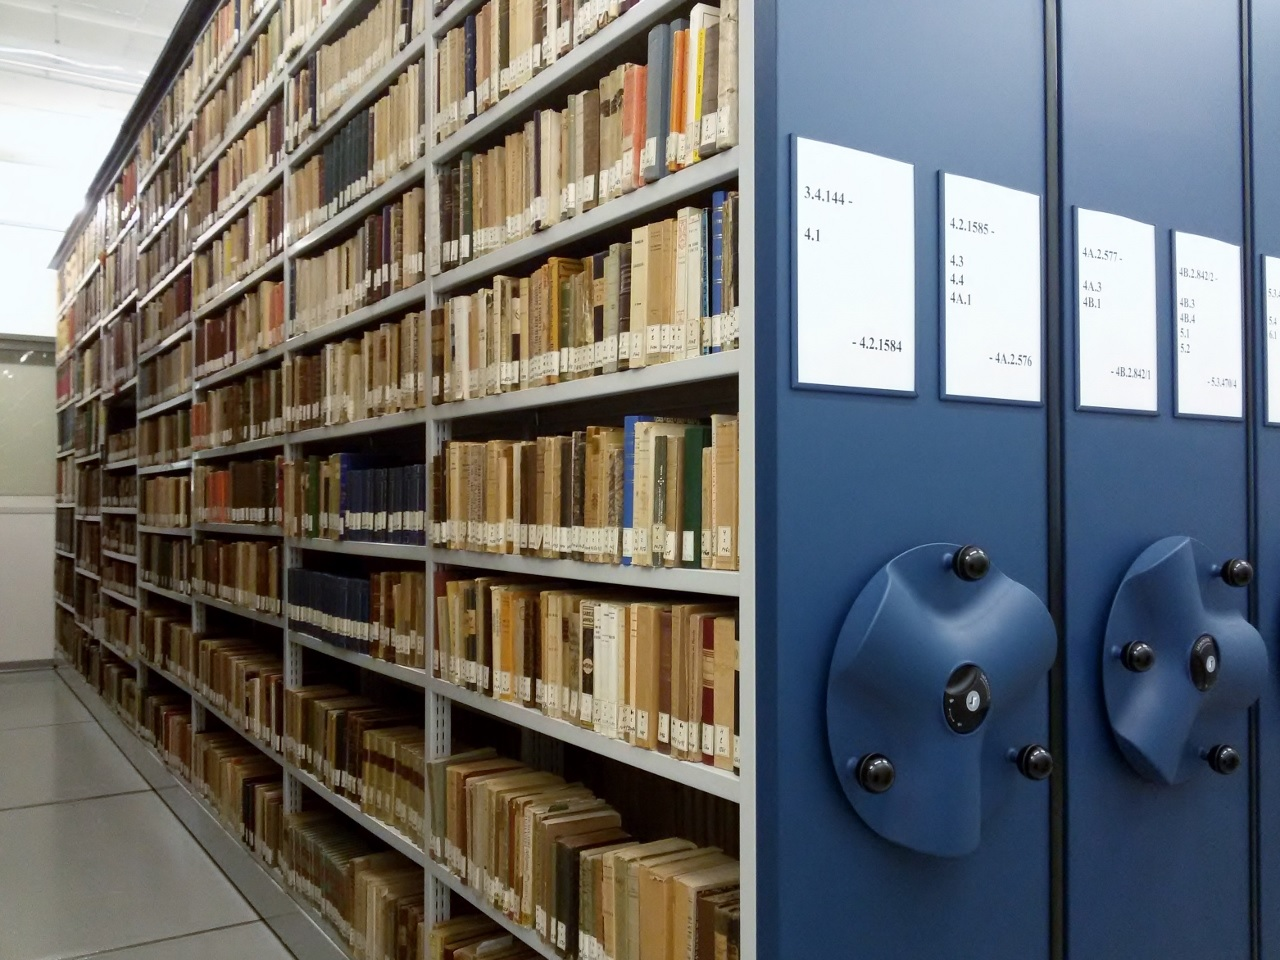 Scaffalature Metalliche Dwg.Associazione Dei Bibliotecari Ecclesiastici Italiani